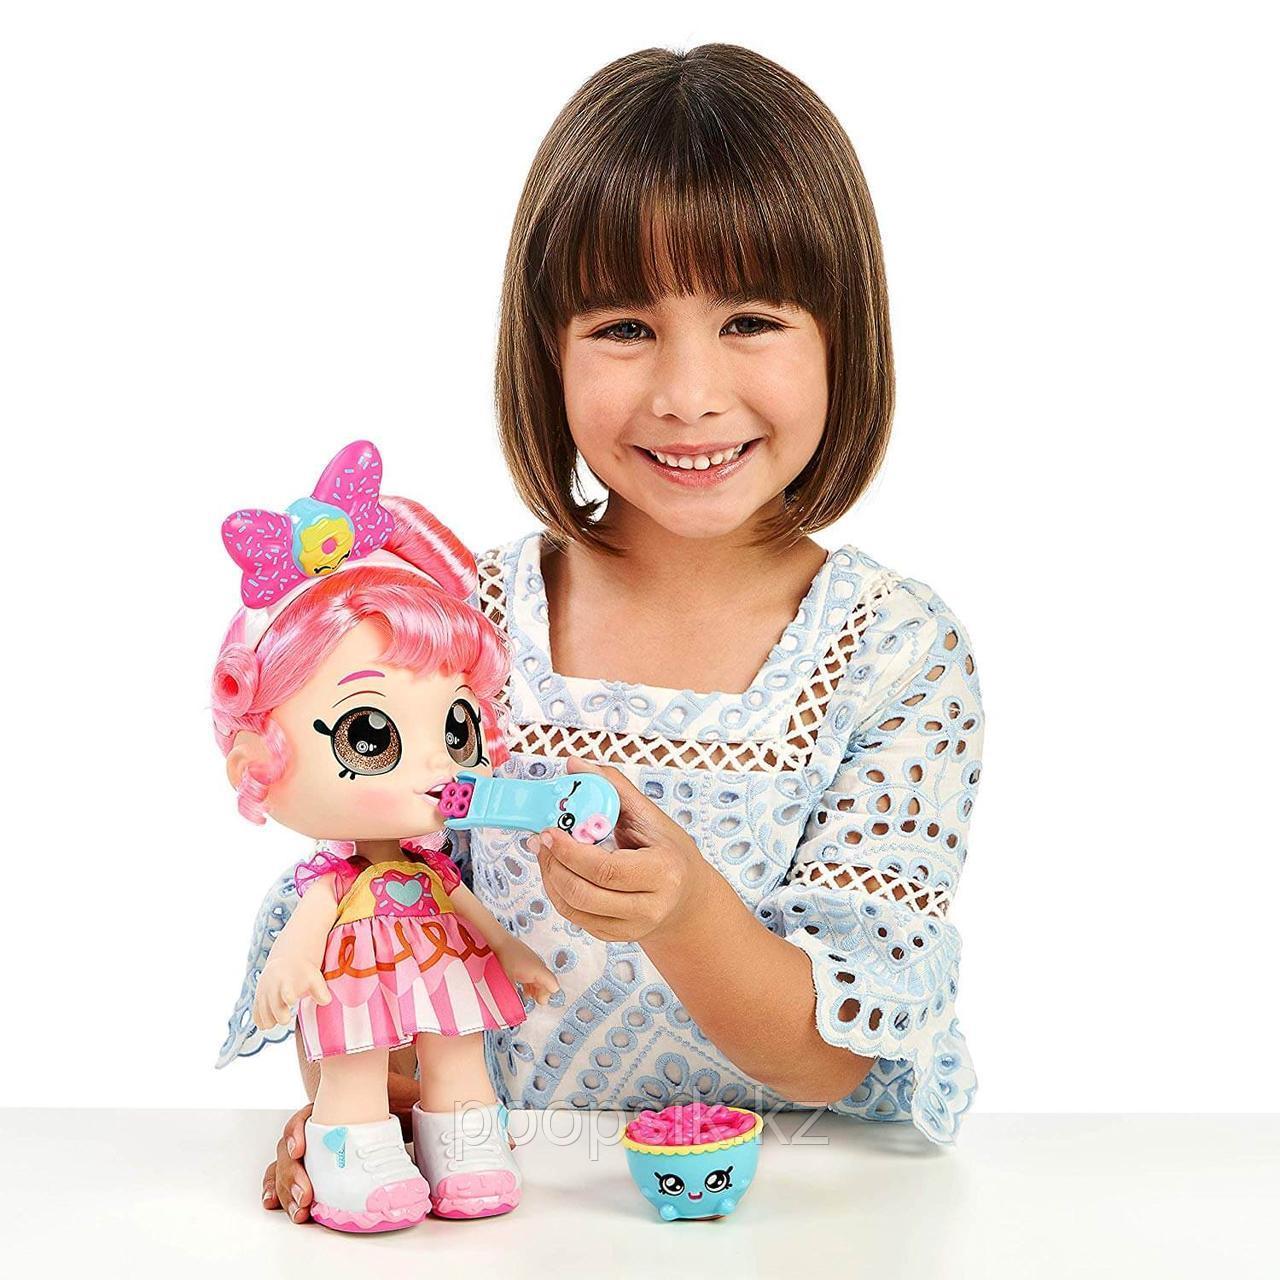 Кукла Кинди Кидс Донатина (Пончик) 25см - фото 2